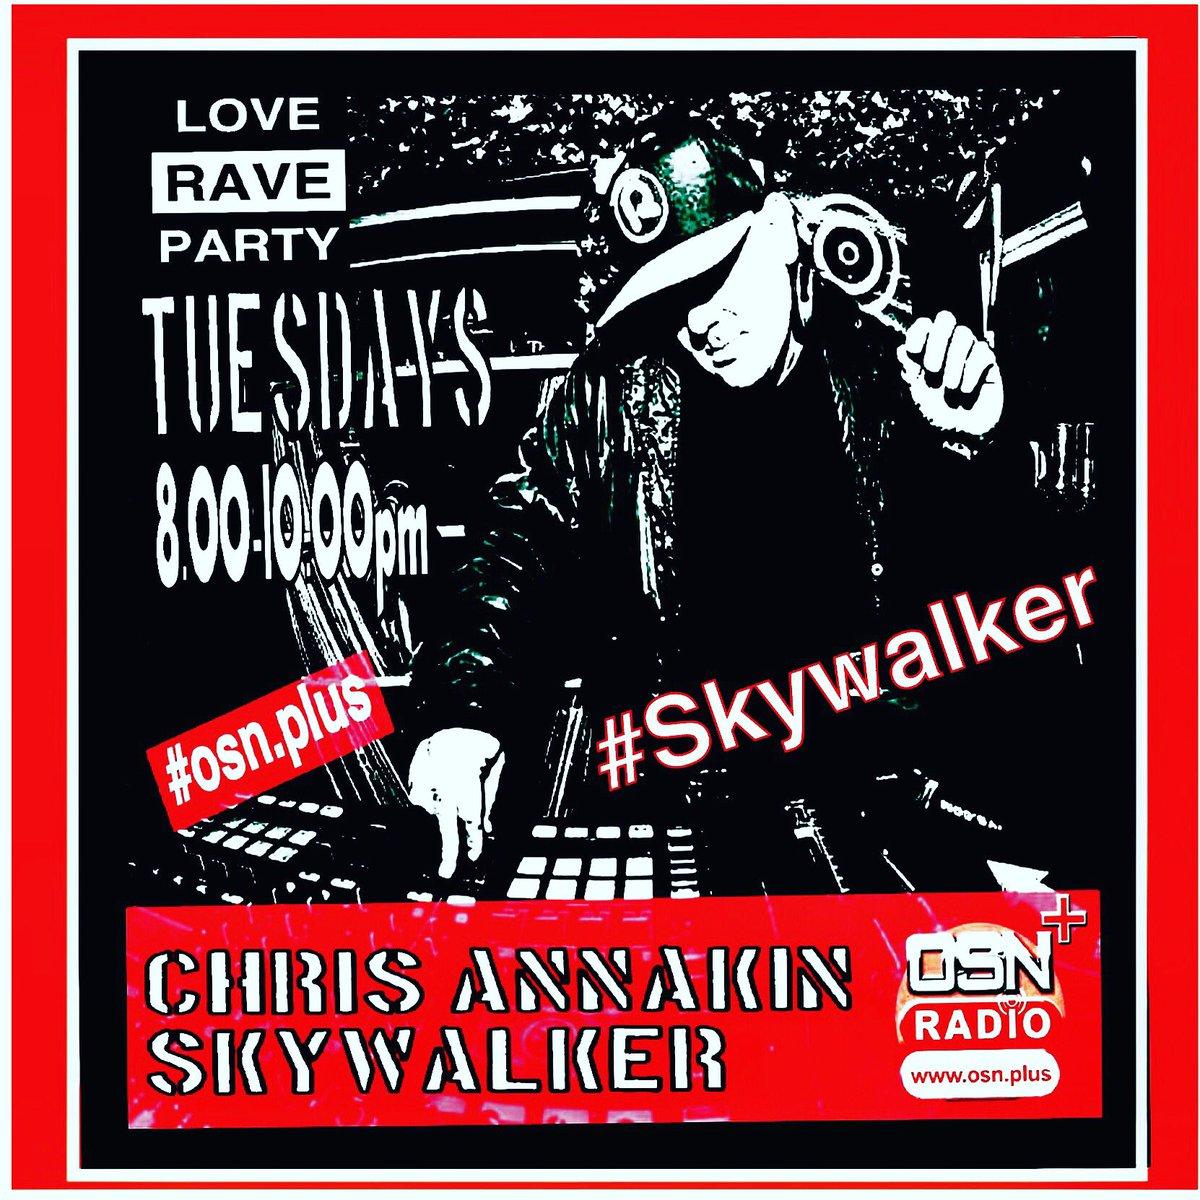 #one #love #rave #party #the #return #recording of last nights #live #90s #oldskool #house #radio #show #chris #anakinskywalker #skywalker #osnradioplus #manchester #uk #classic #trance #breakbeat #retro https://m.mixcloud.com/DJChrisAkin/chris-annakin-love-rave-party-osn-radio-plus-230419/…